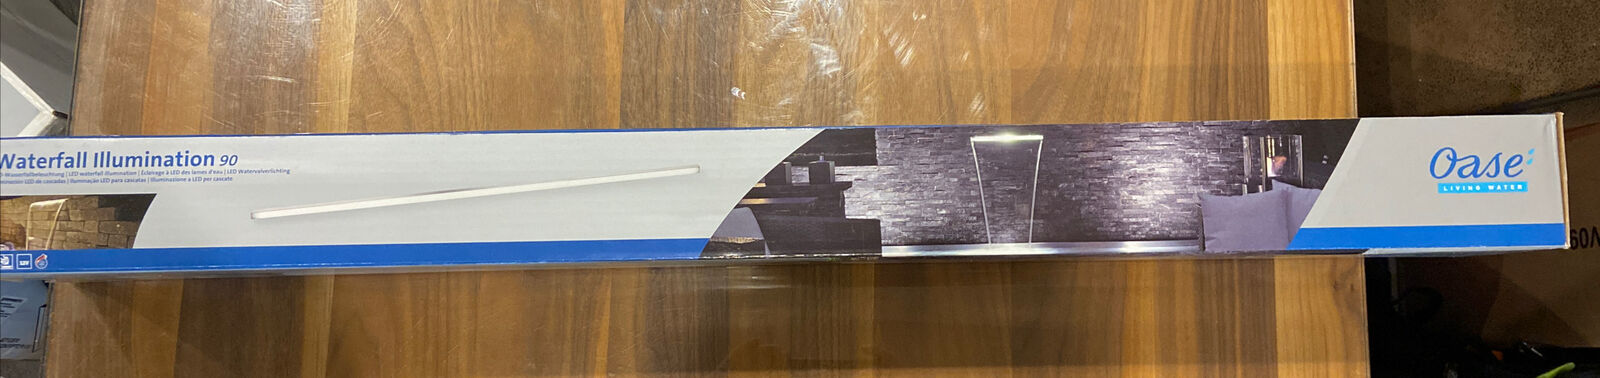 OASE WATERFALL ILLUMINATION LED LIGHTING POND CASCADE SPILLWAY WATER BLADE